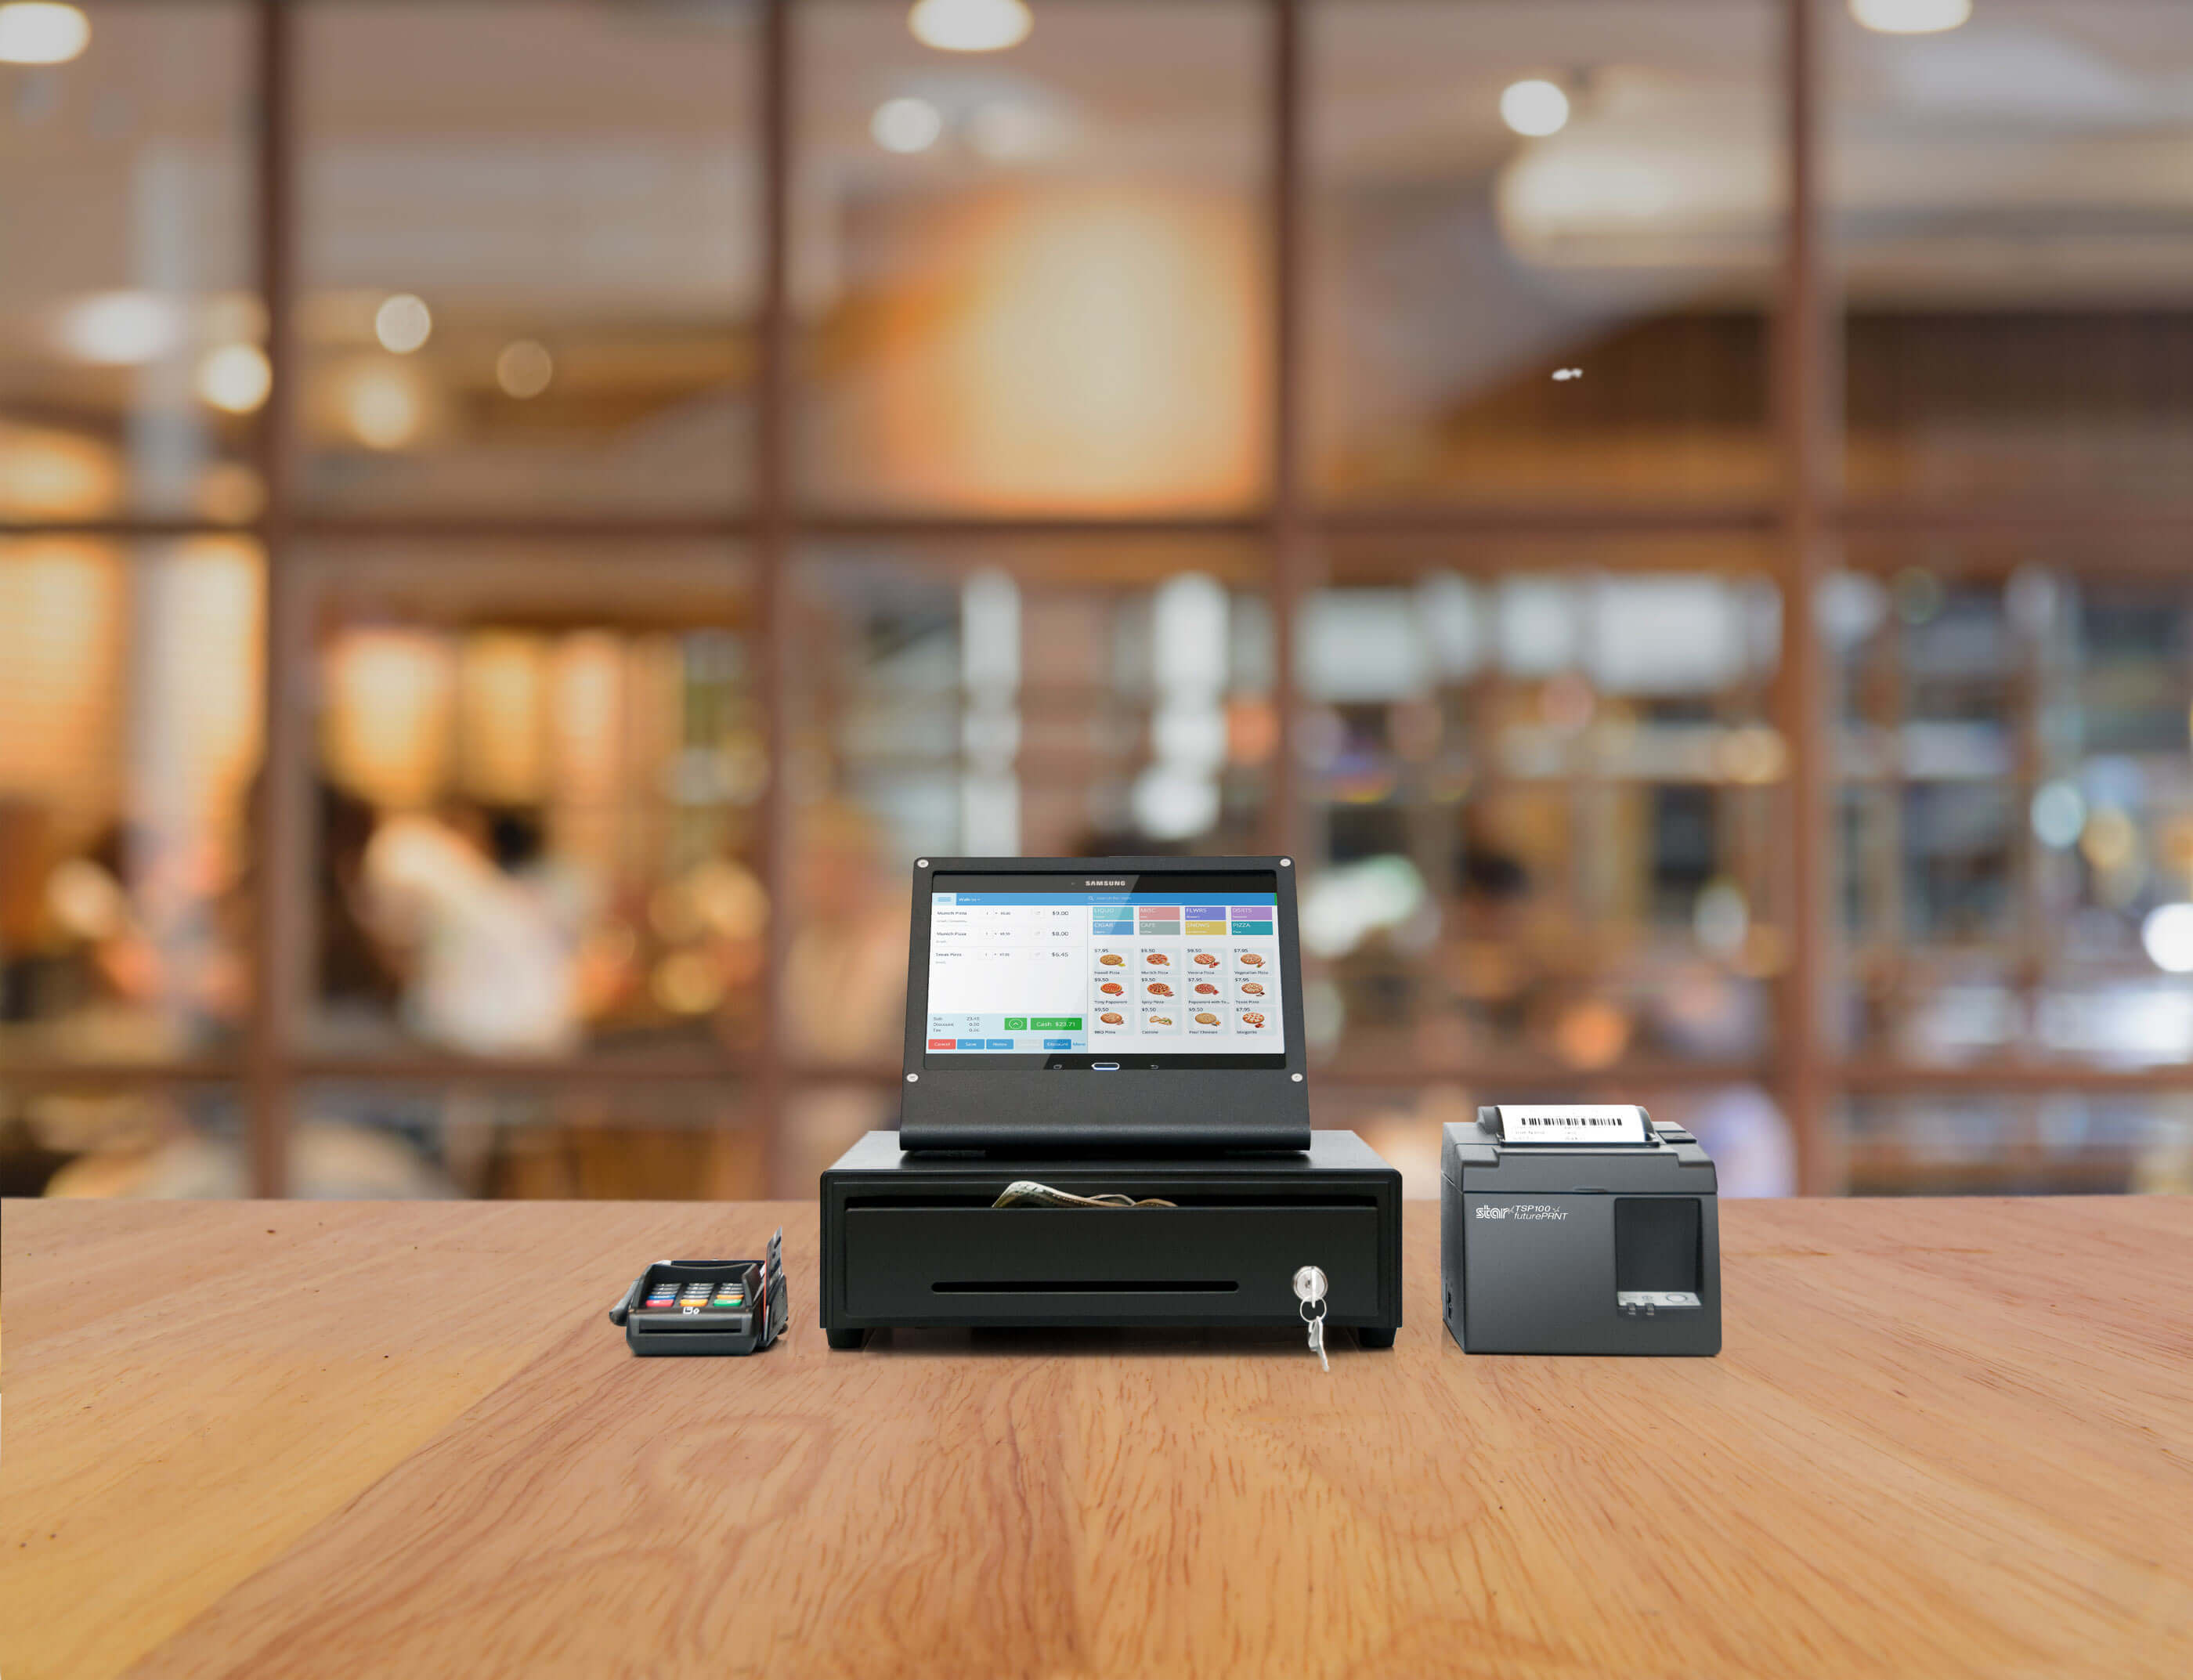 eHopper POS Announces QuickBooks Integration to Power Small Businesses